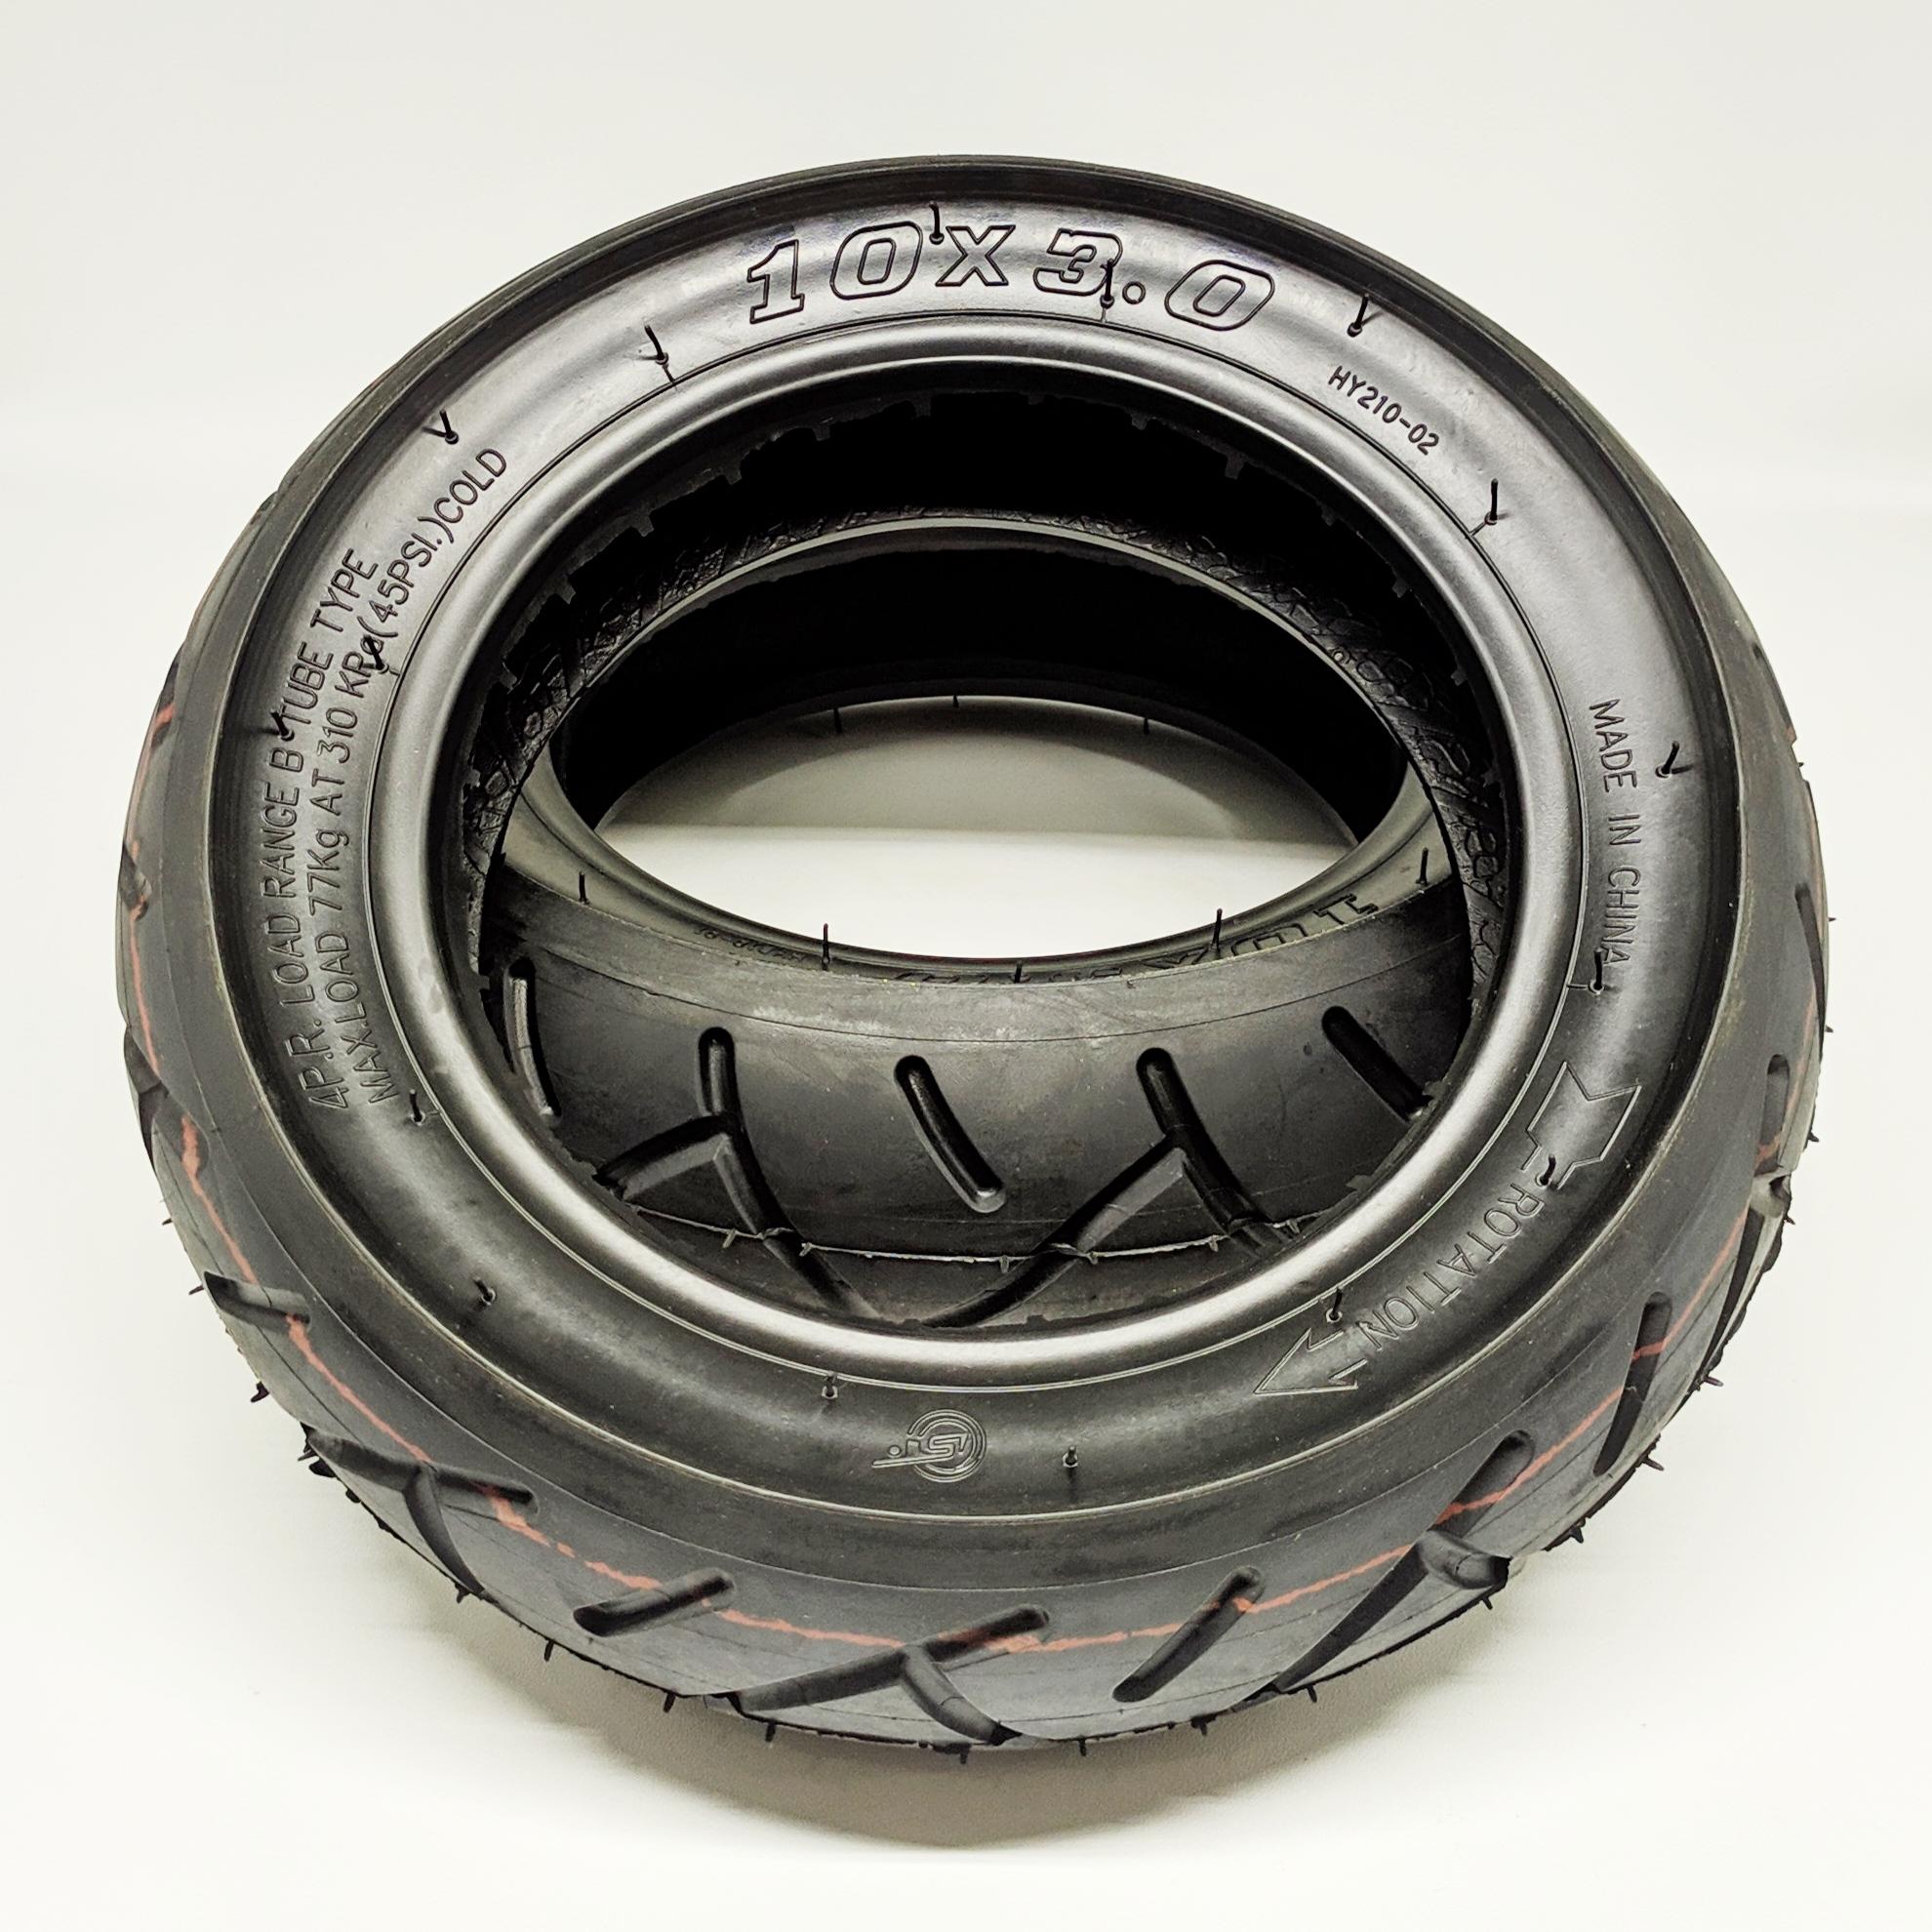 IMG 20200519 153017 - 10 x 3 inch GST Vacuum Tire